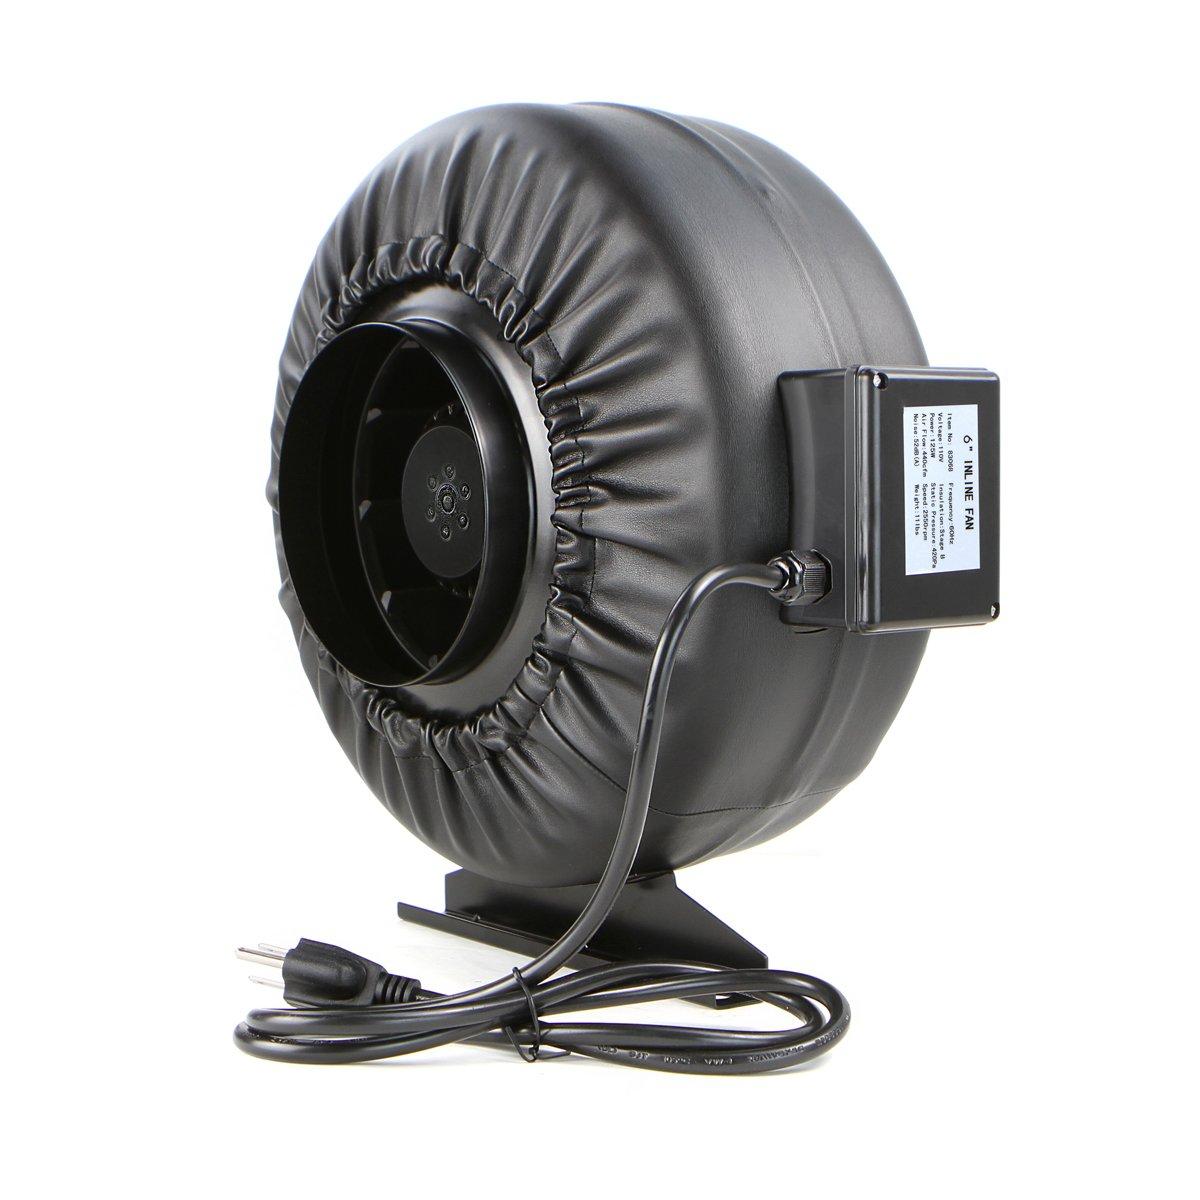 XtremepowerUS 6'' Inline Duct Fan 440 CFM